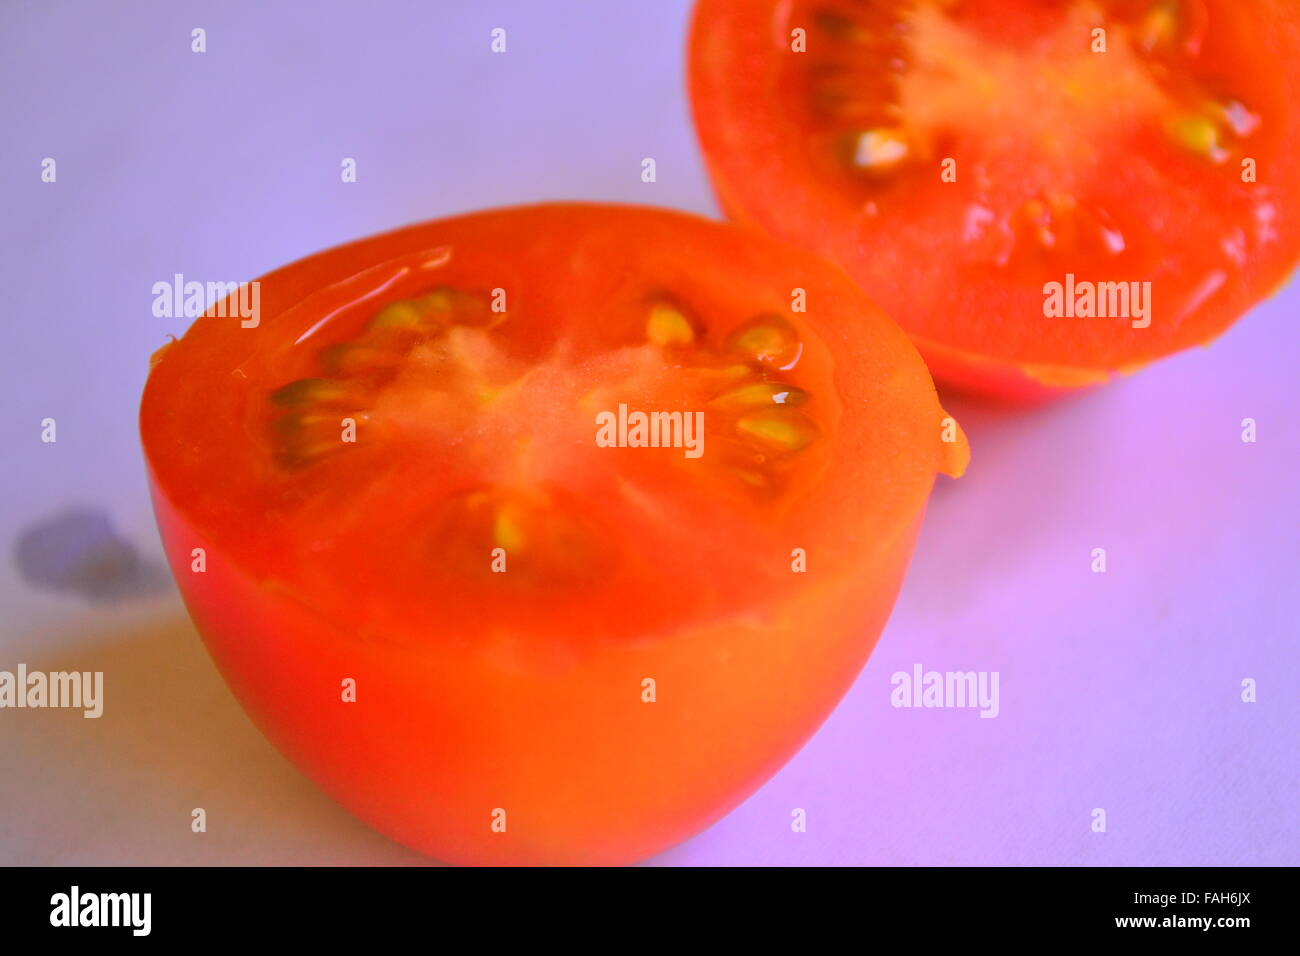 Cut tomato - Stock Image